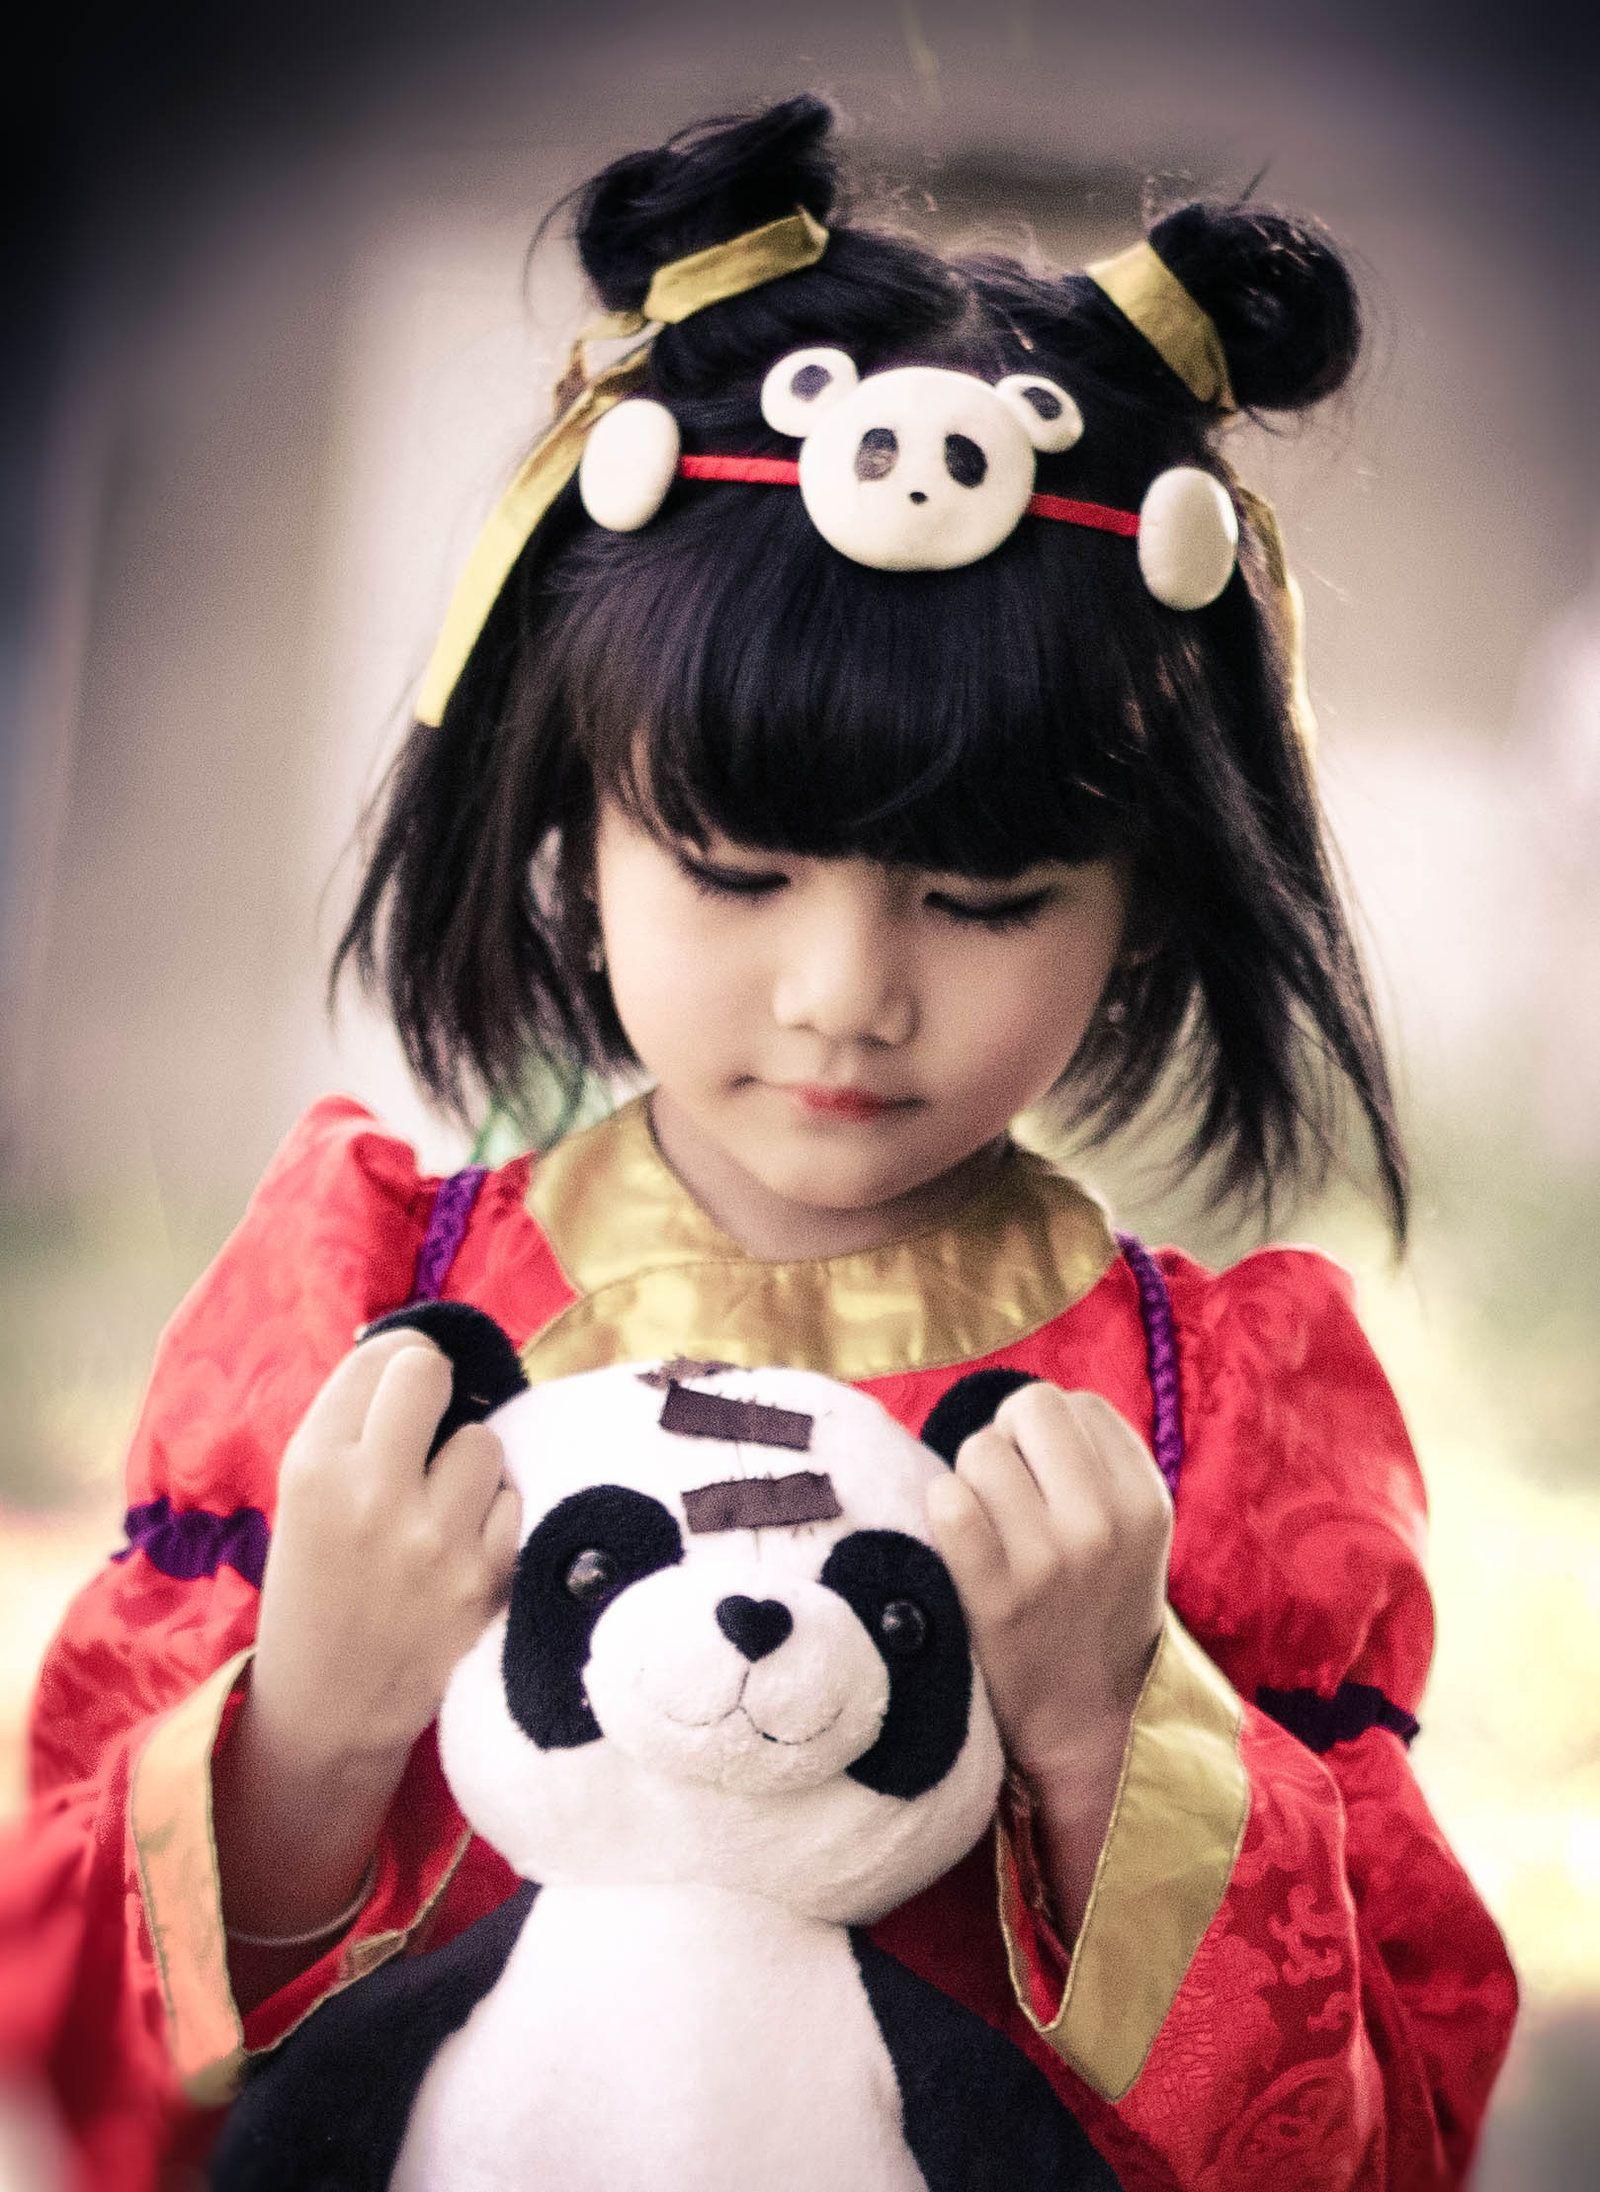 League of legends panda annie